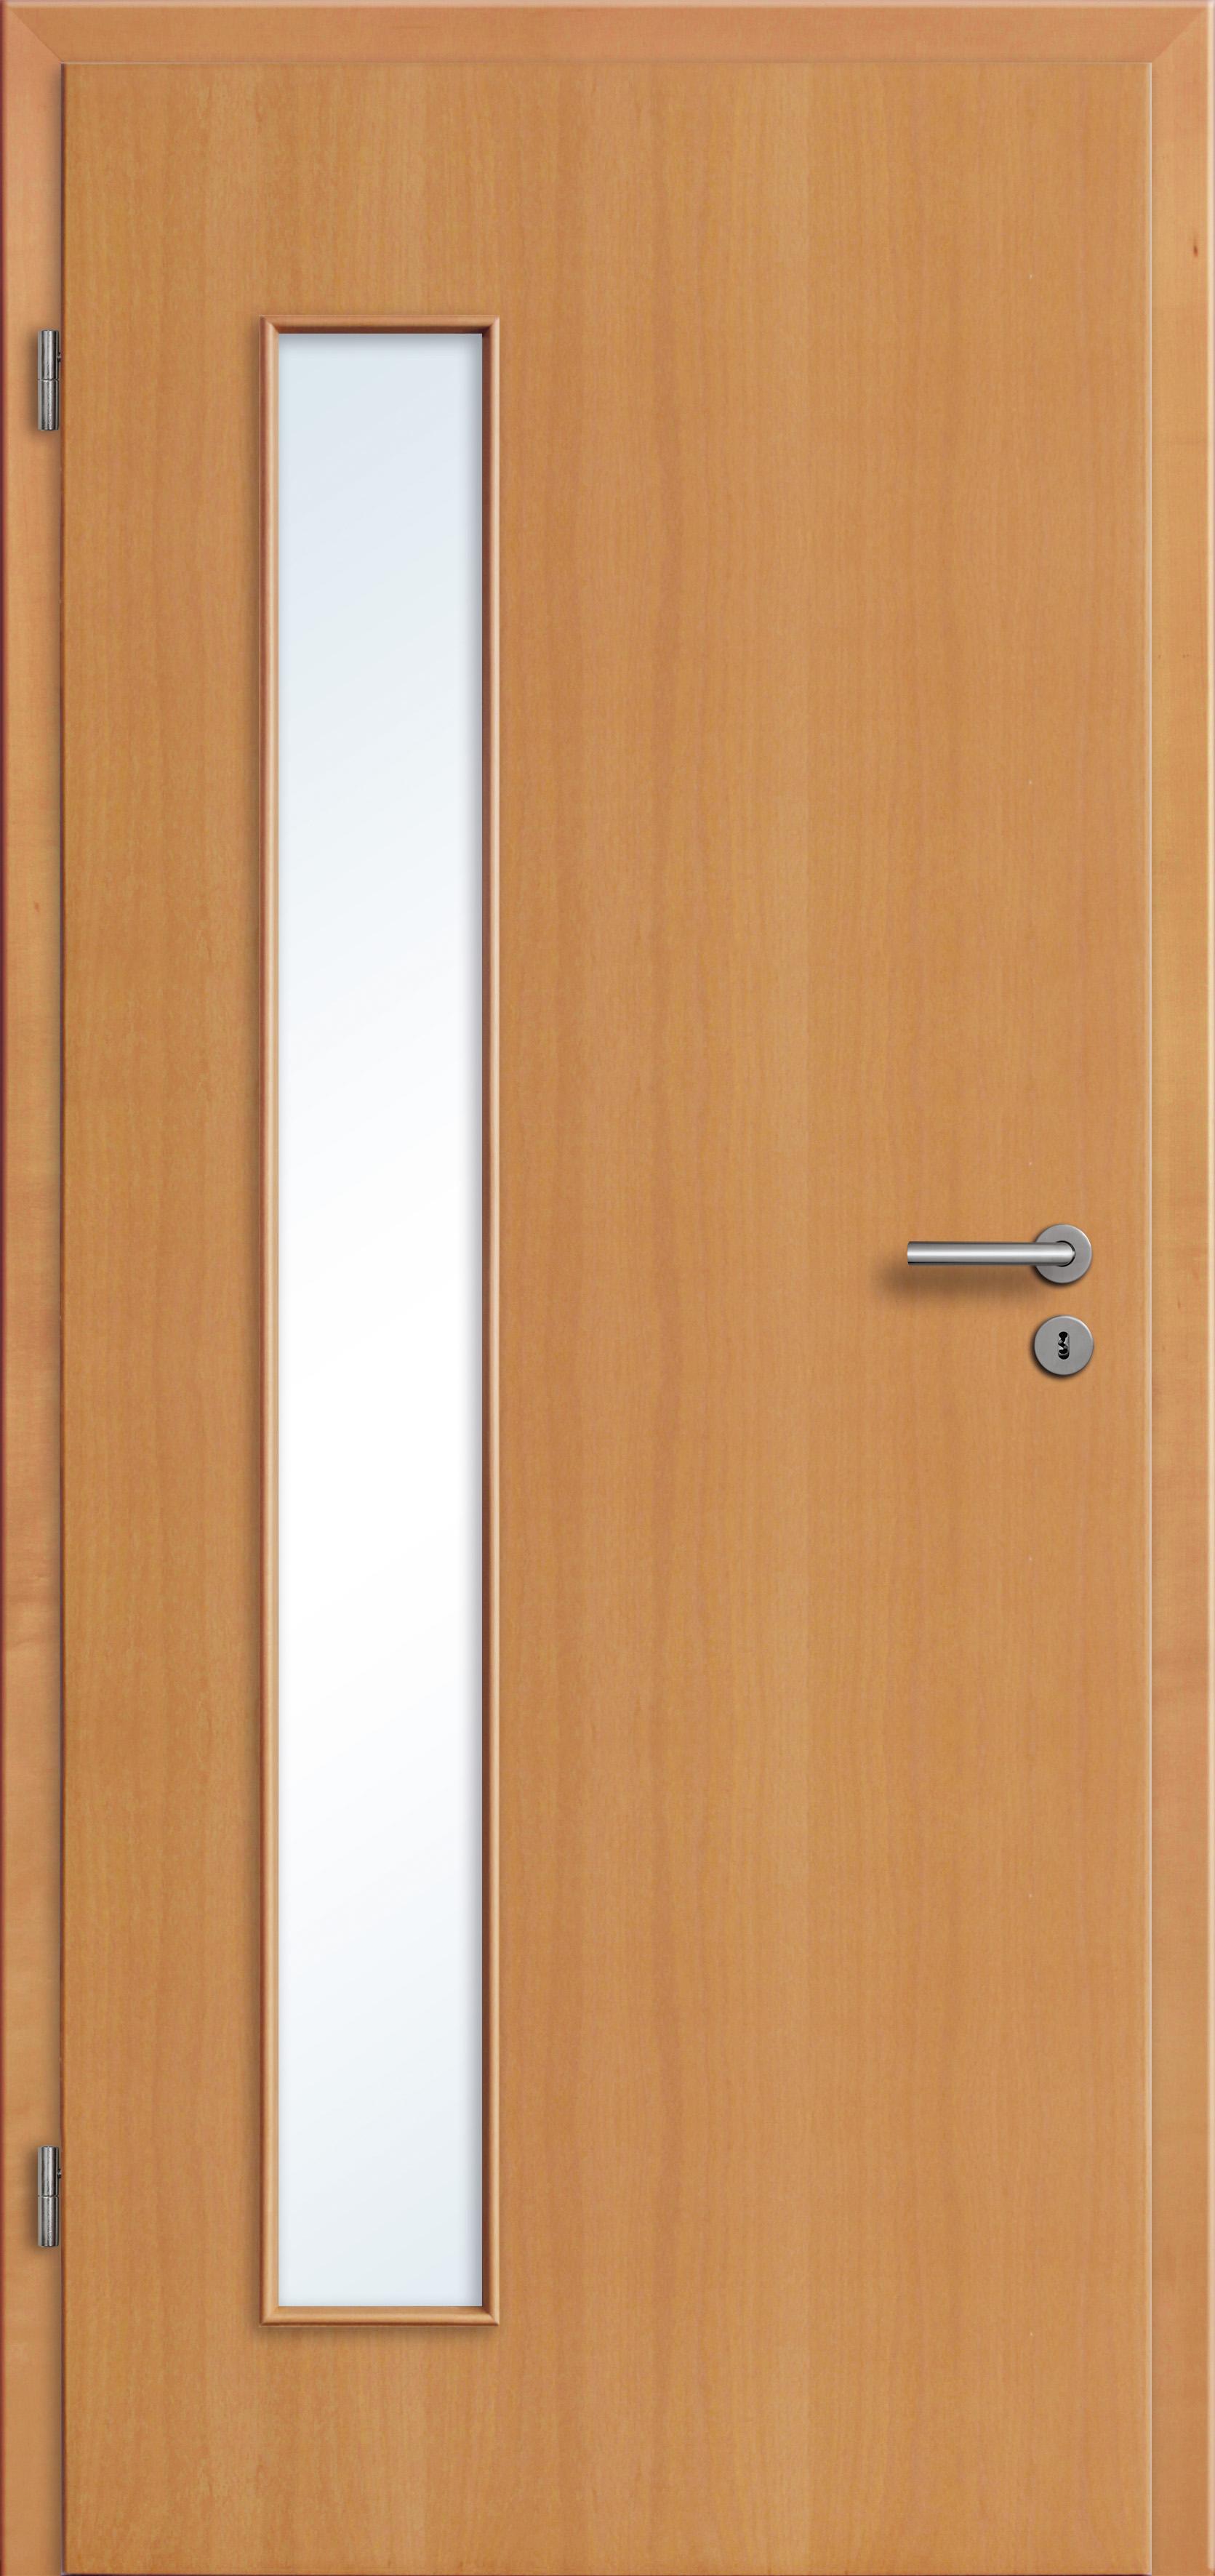 zimmert r echtholz furnier buche mit la no 3 woodi24. Black Bedroom Furniture Sets. Home Design Ideas